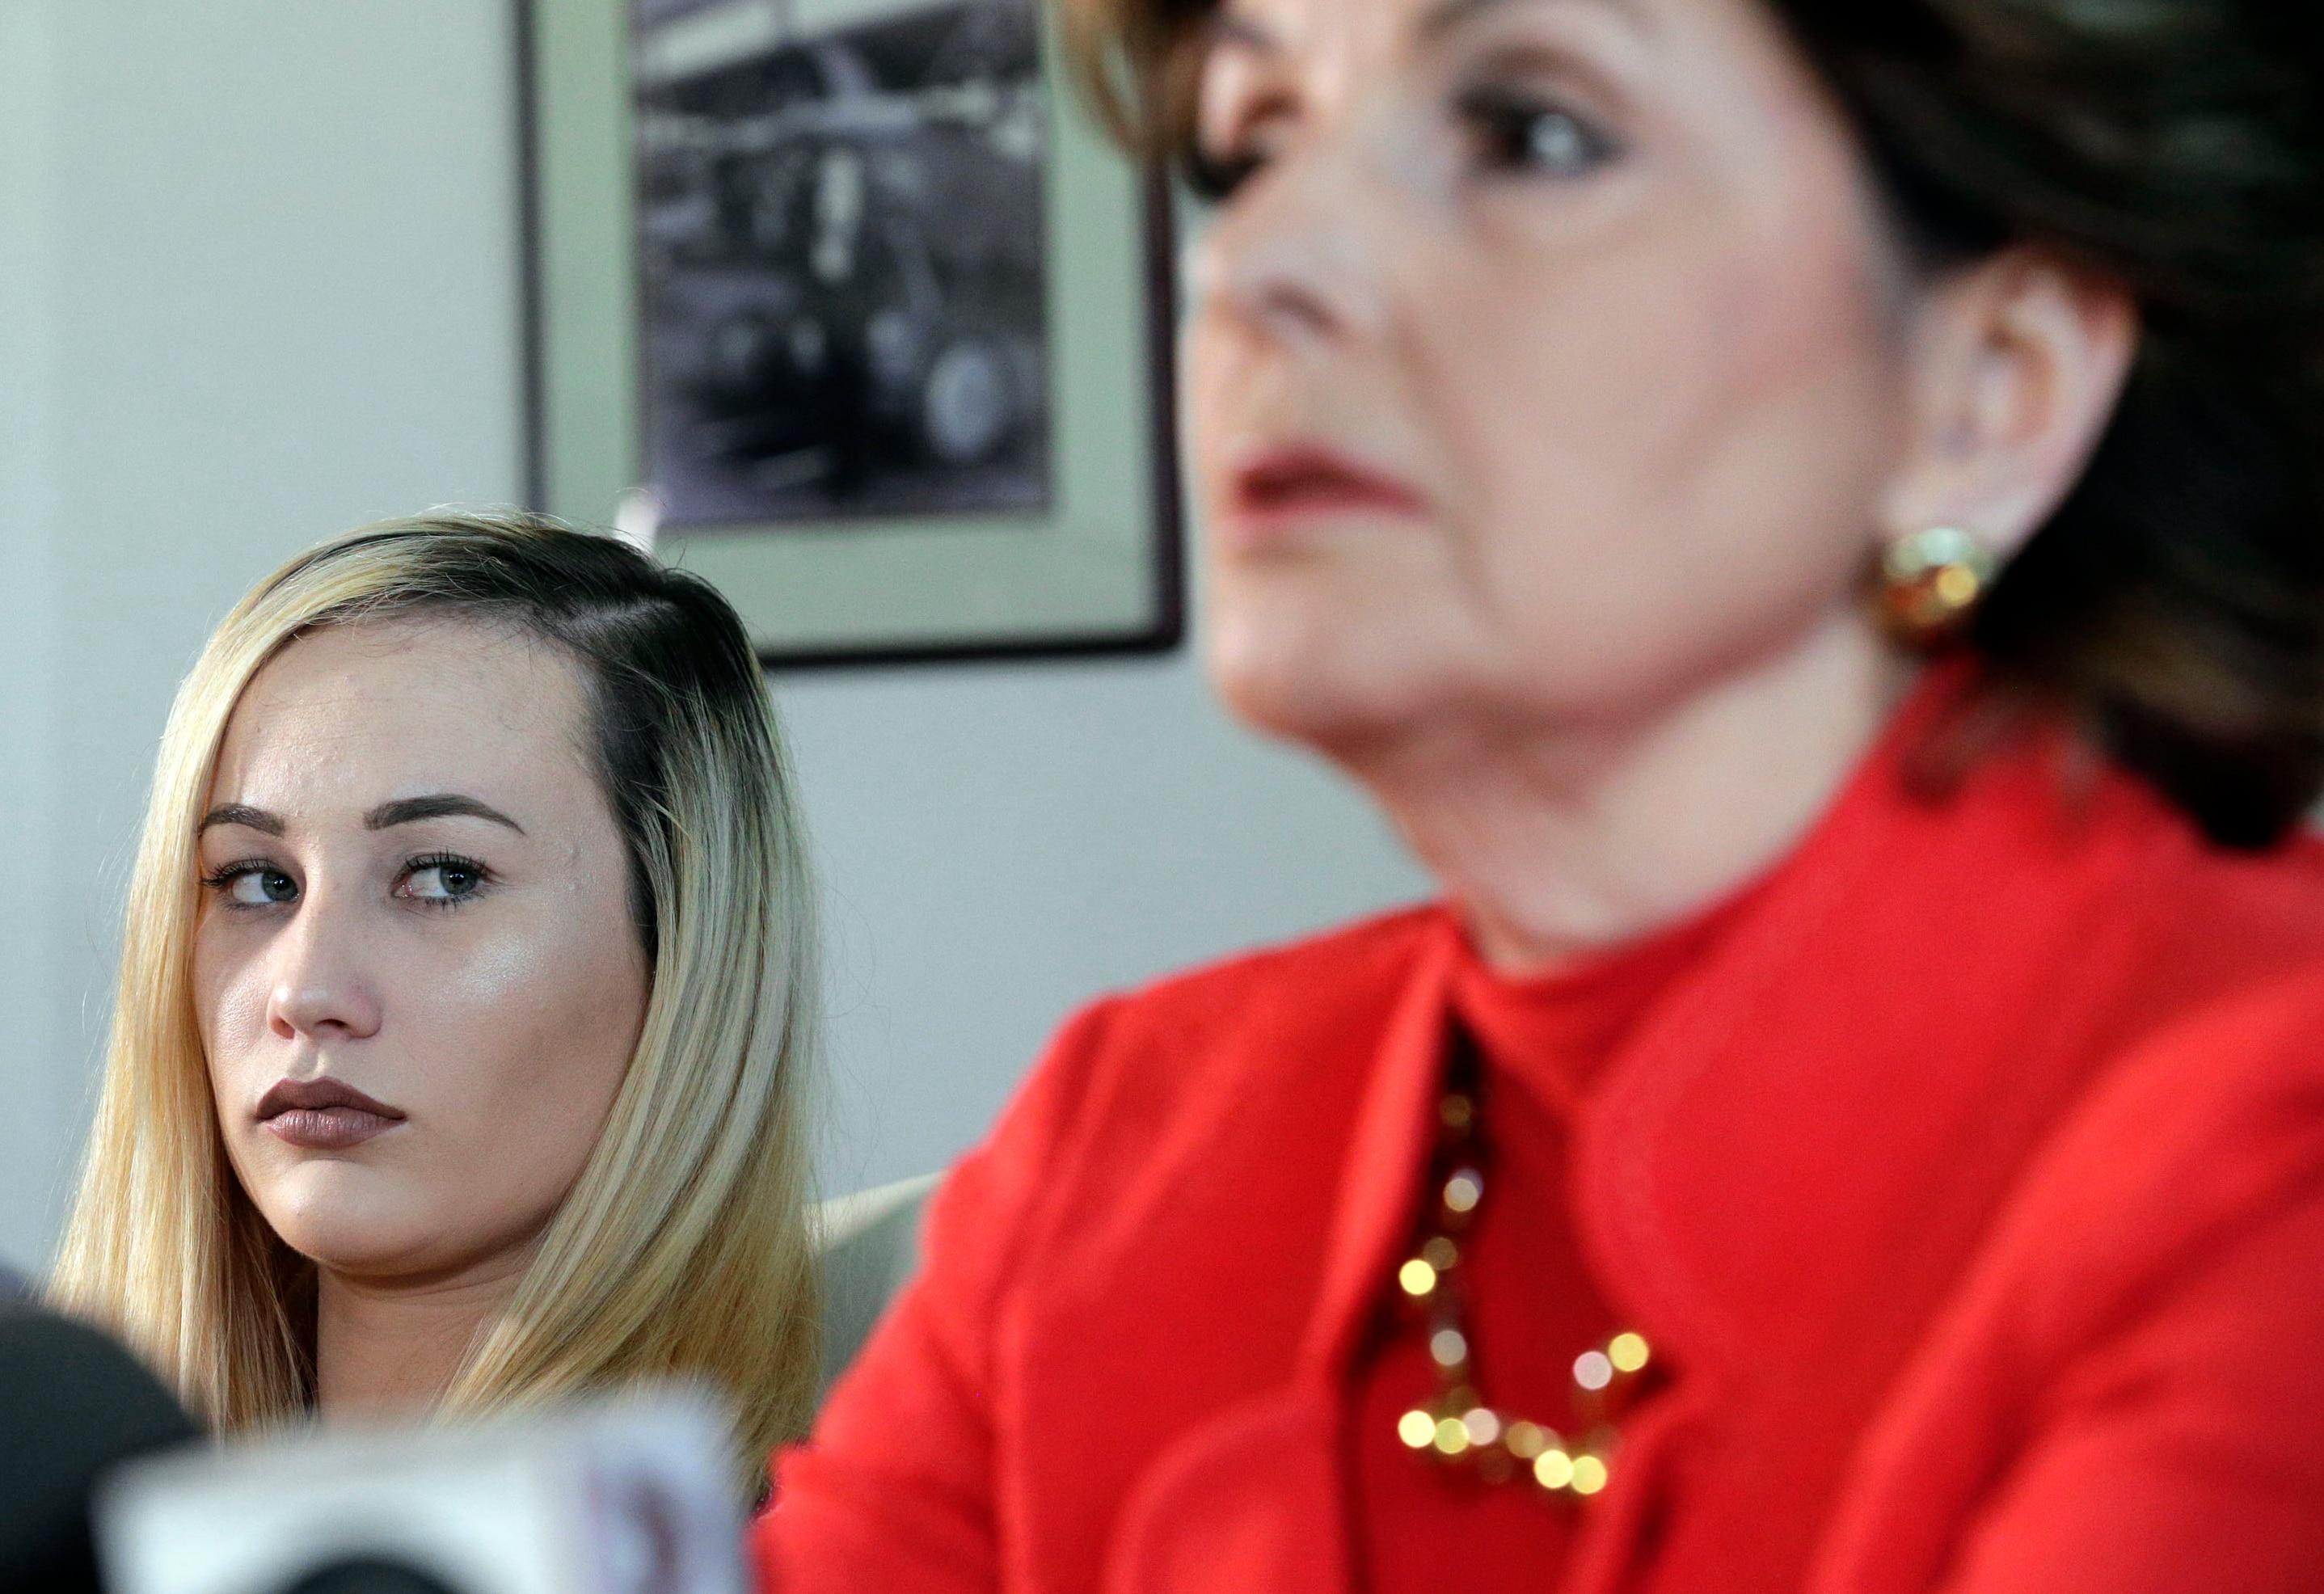 Sen. Kirsten Gillibrand wants Senate hearing on Marine Corps nude photo scandal